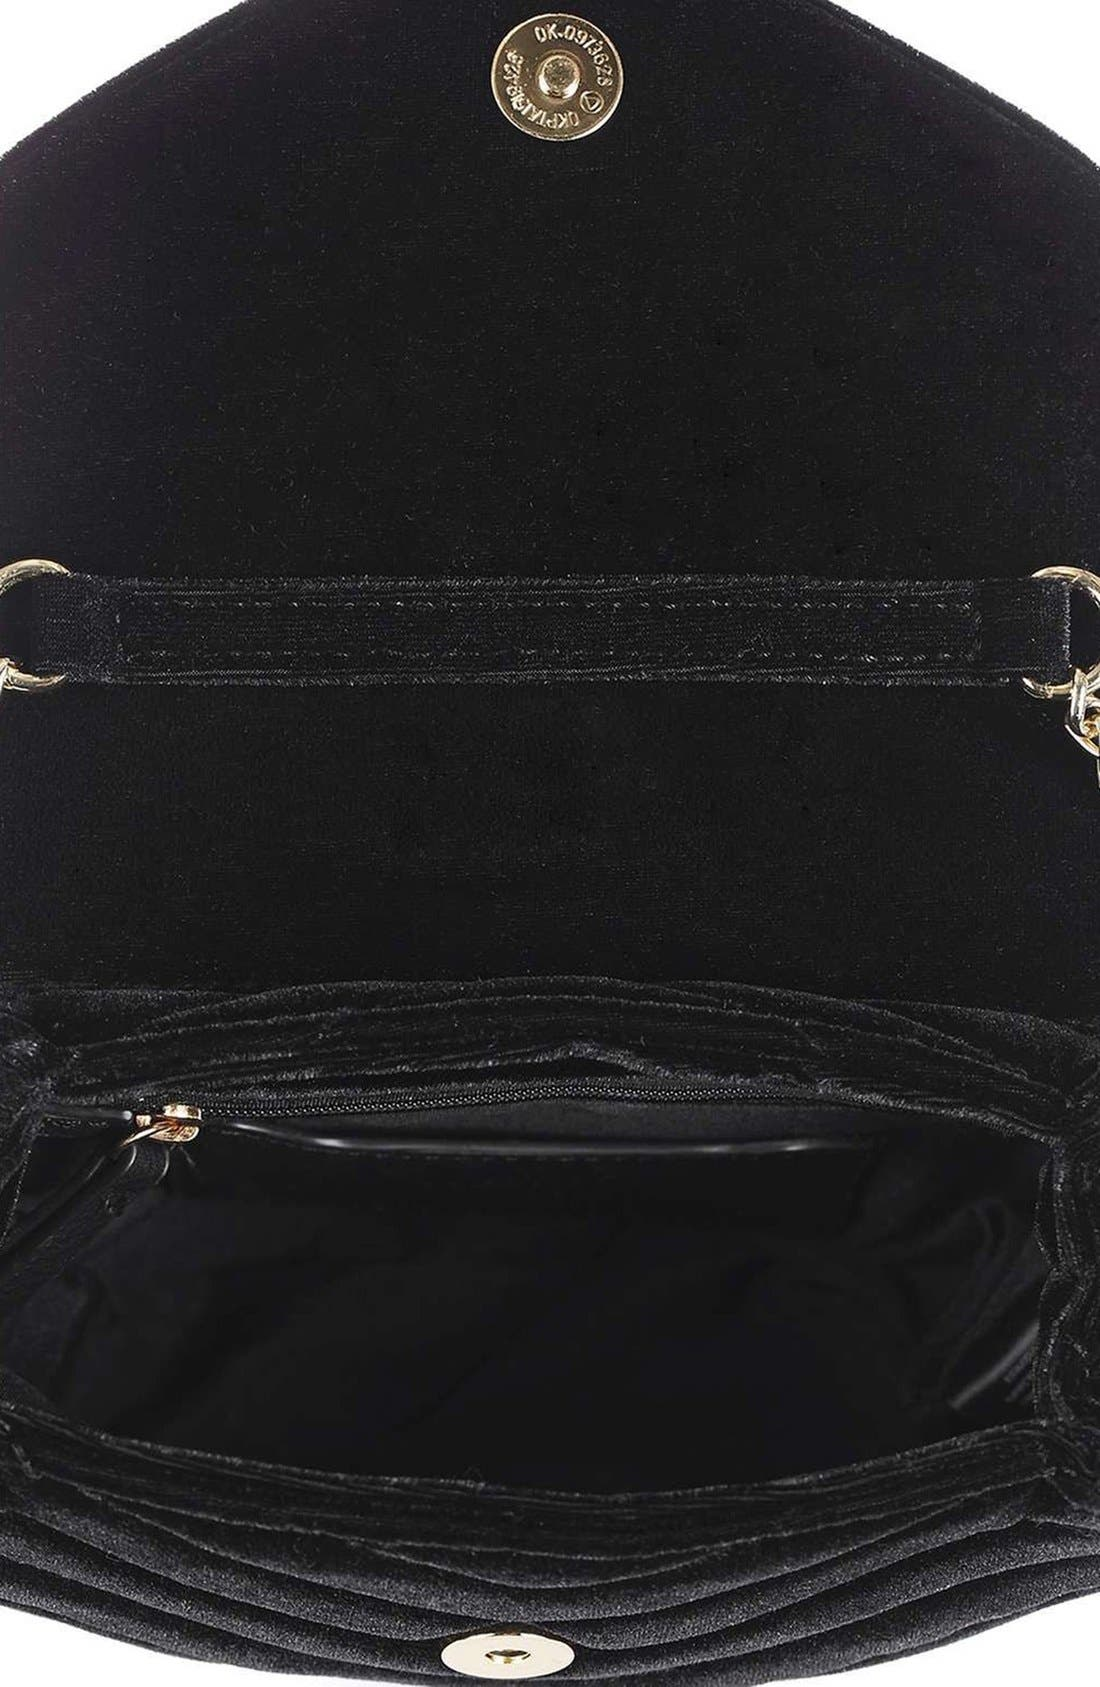 TOPSHOP, Embellished Velvet Crossbody Bag, Alternate thumbnail 2, color, 001